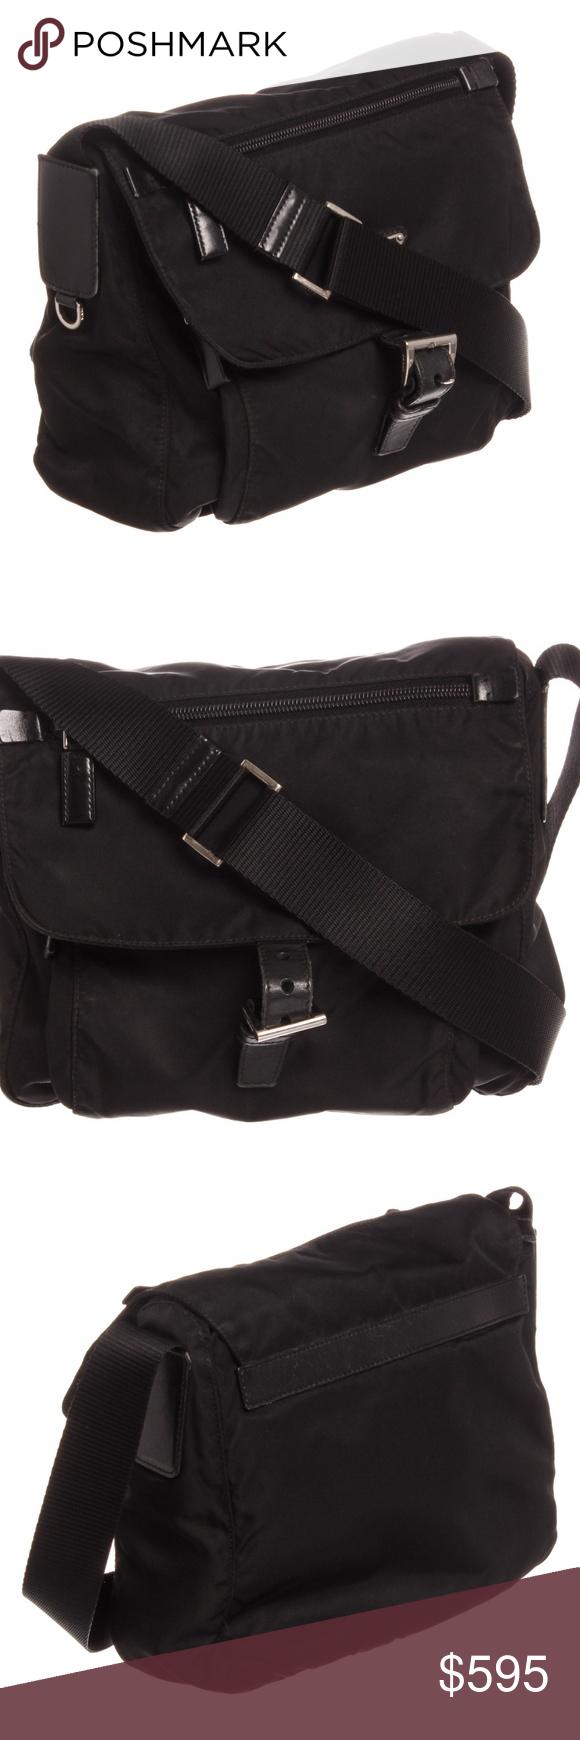 be26e249f90f Prada Black Nylon Leather Crossbody Flap Bag Black Prada nylon leather  crossbody bag with silver tone